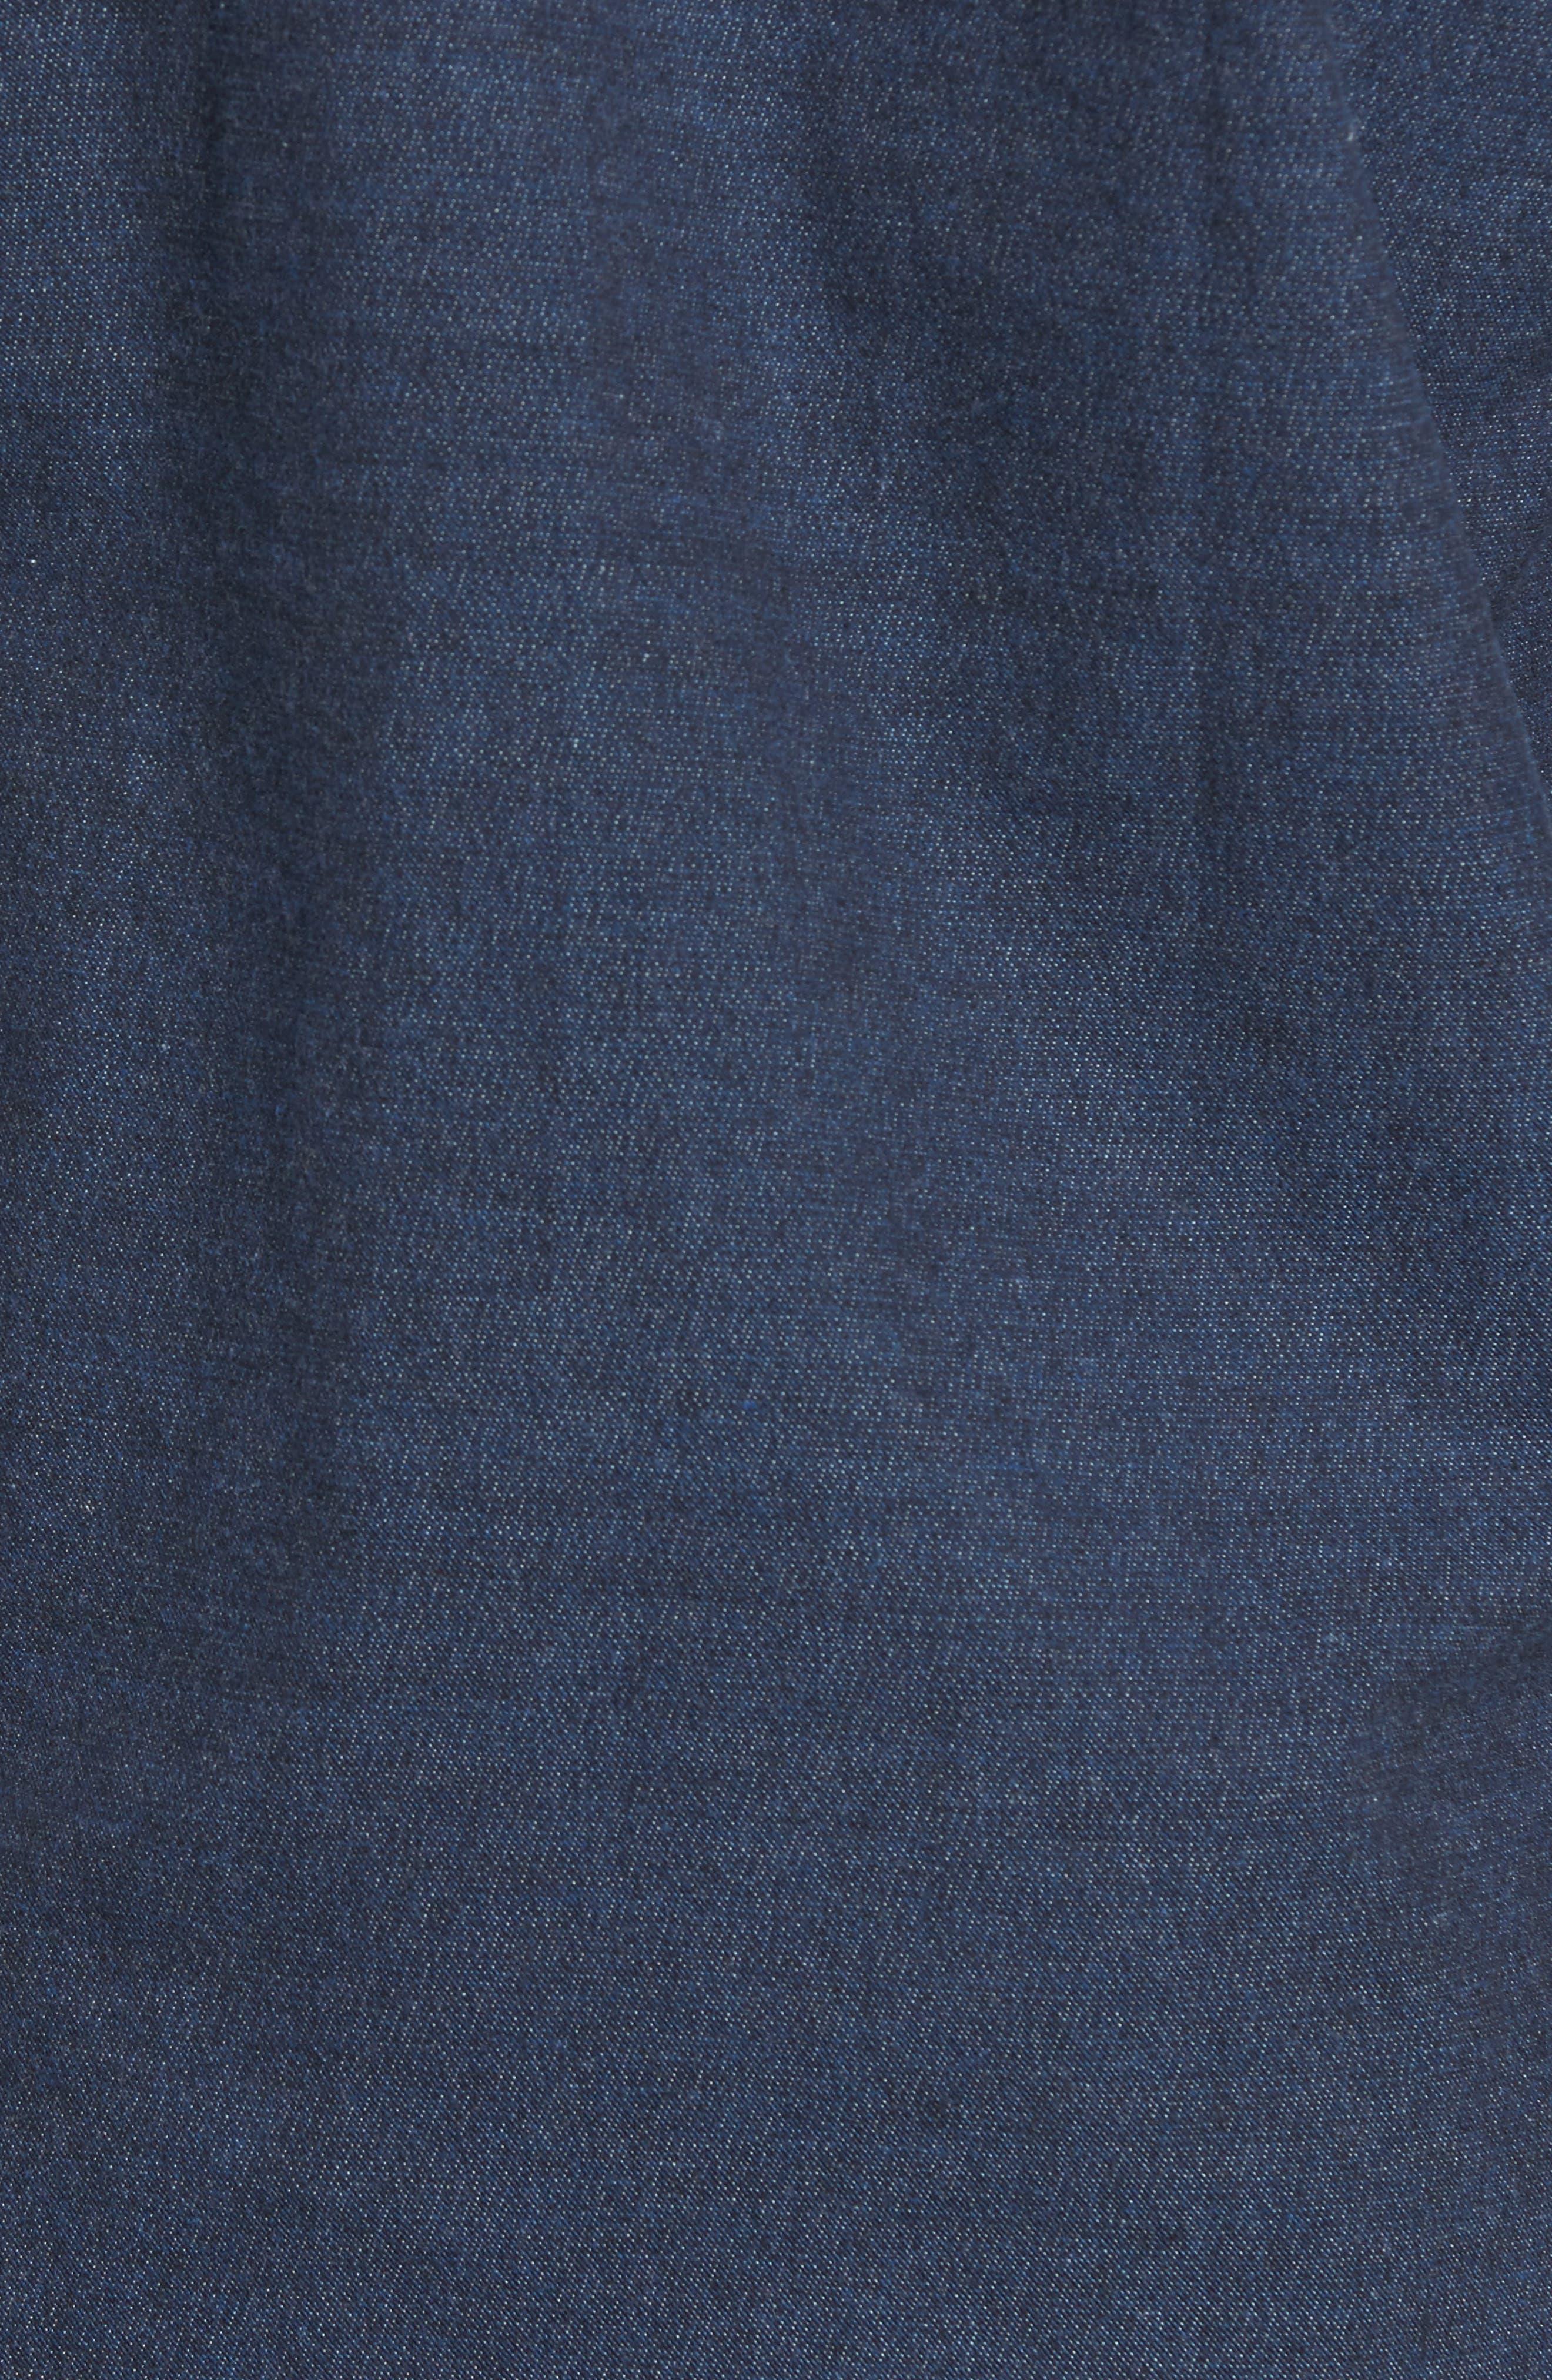 Regular Fit Sport Shirt,                             Alternate thumbnail 2, color,                             400